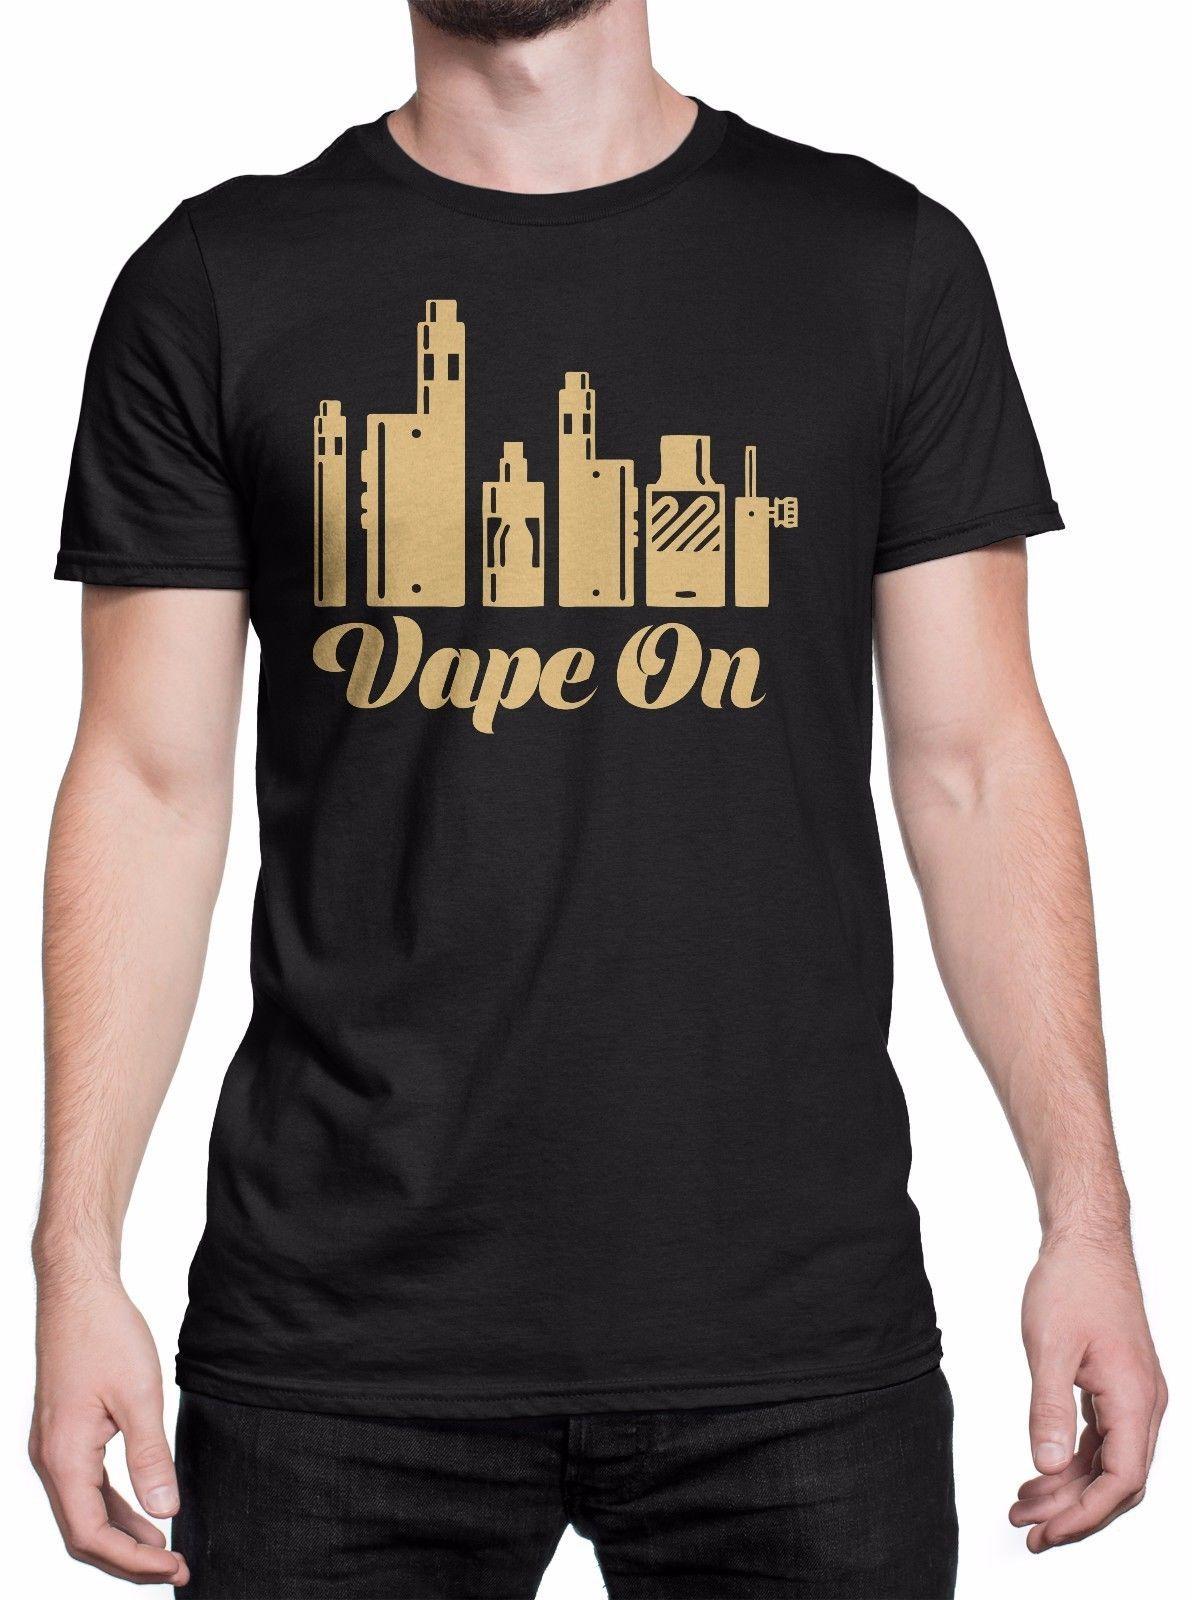 T Shirt Uomo Vape On Gold Print Maglietta 100 Cotone Nero Shopping